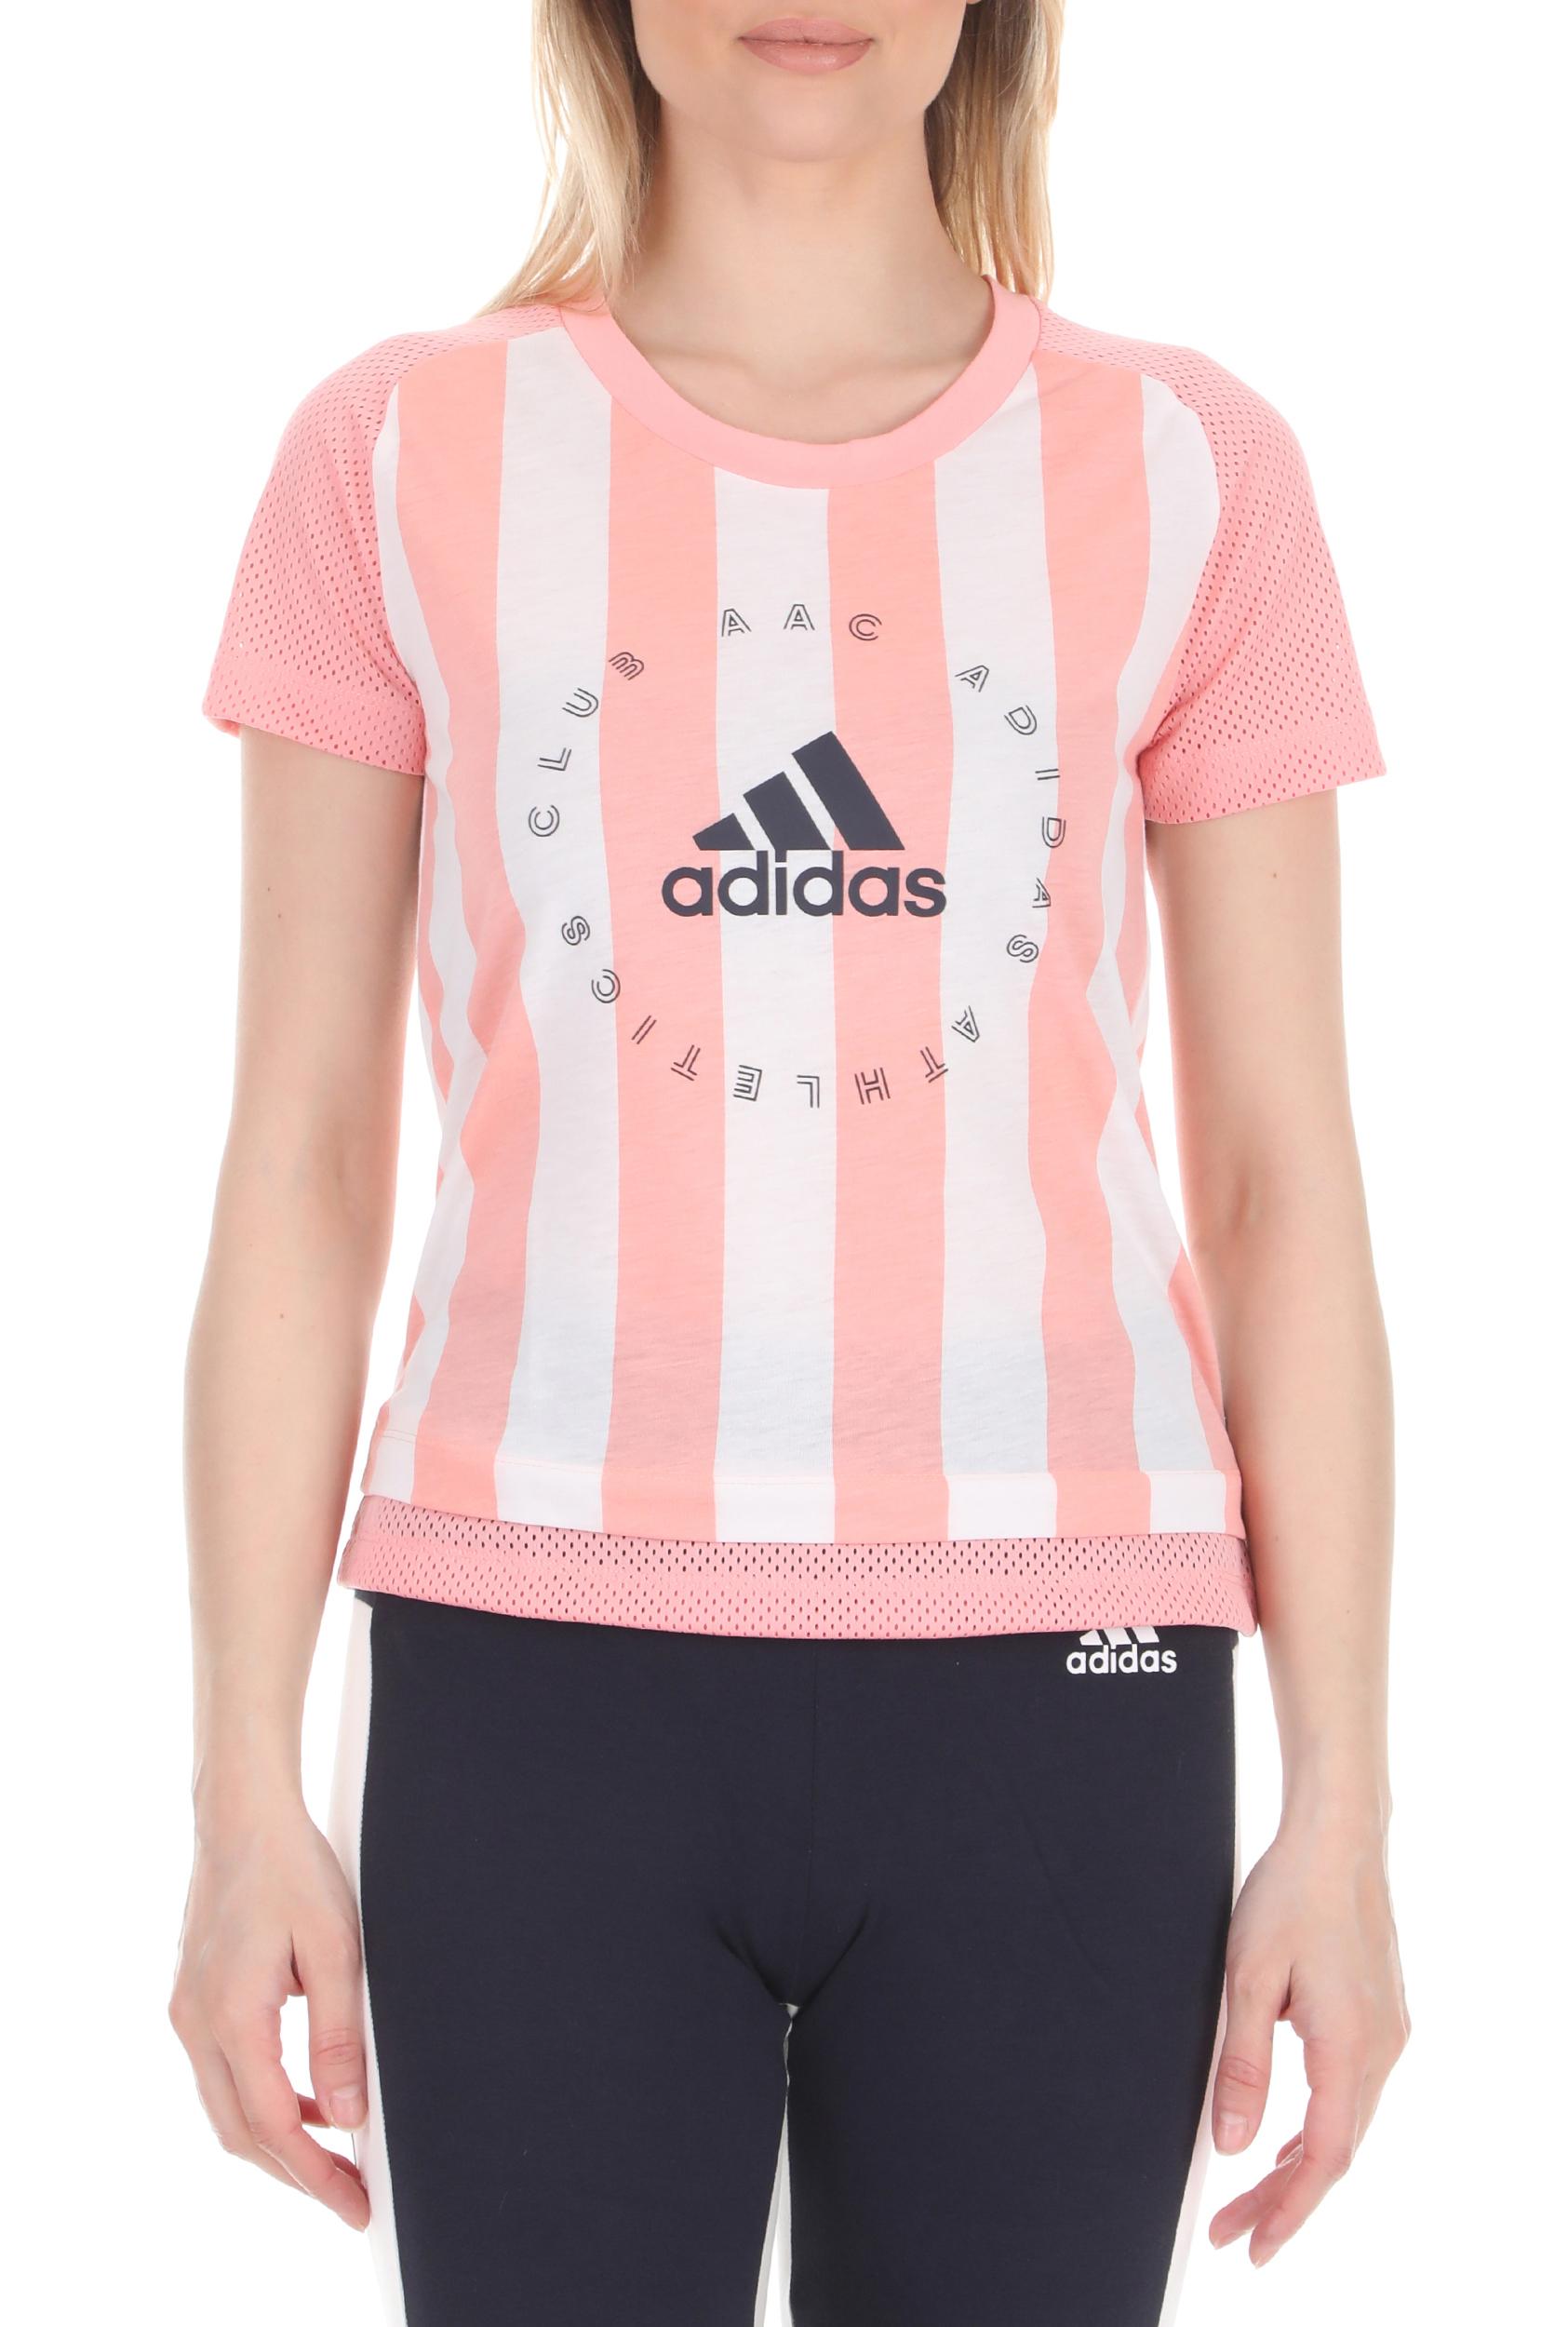 adidas Performance - Γυναικεία μπλούζα adidas Performance W AAC Tee ροζ λευκή